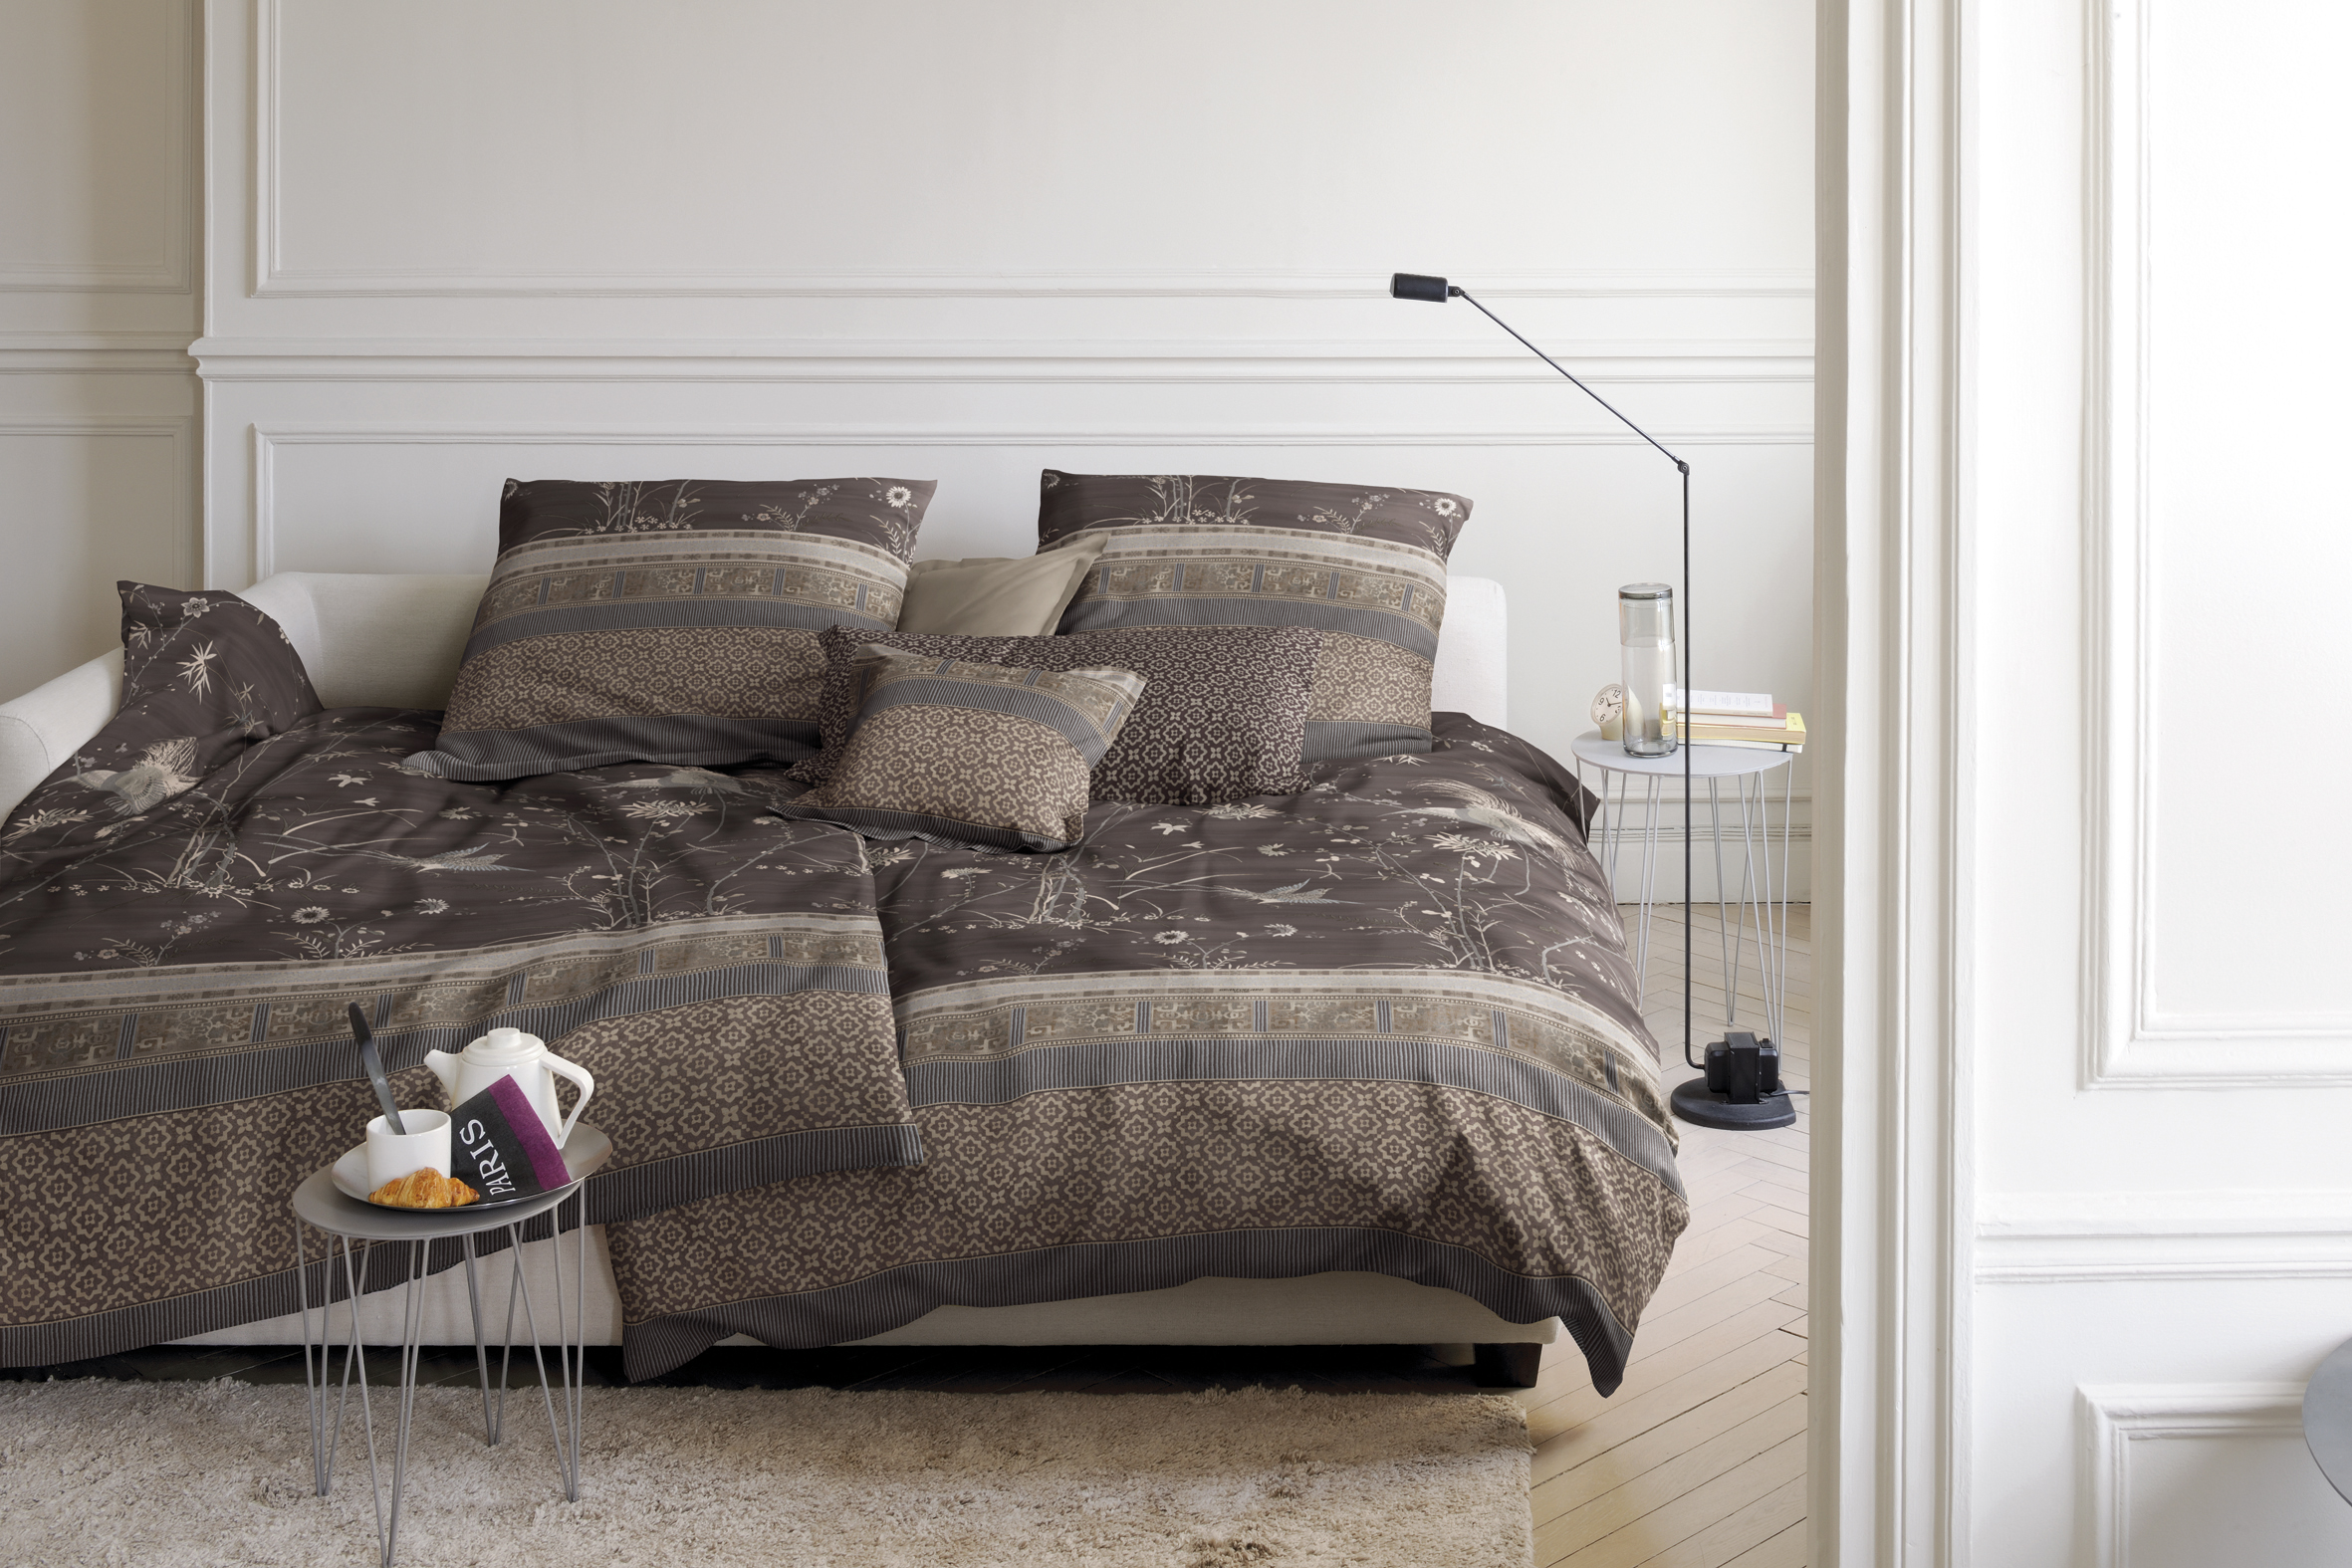 cpp fong grancollage v5 betten h nscheidt. Black Bedroom Furniture Sets. Home Design Ideas